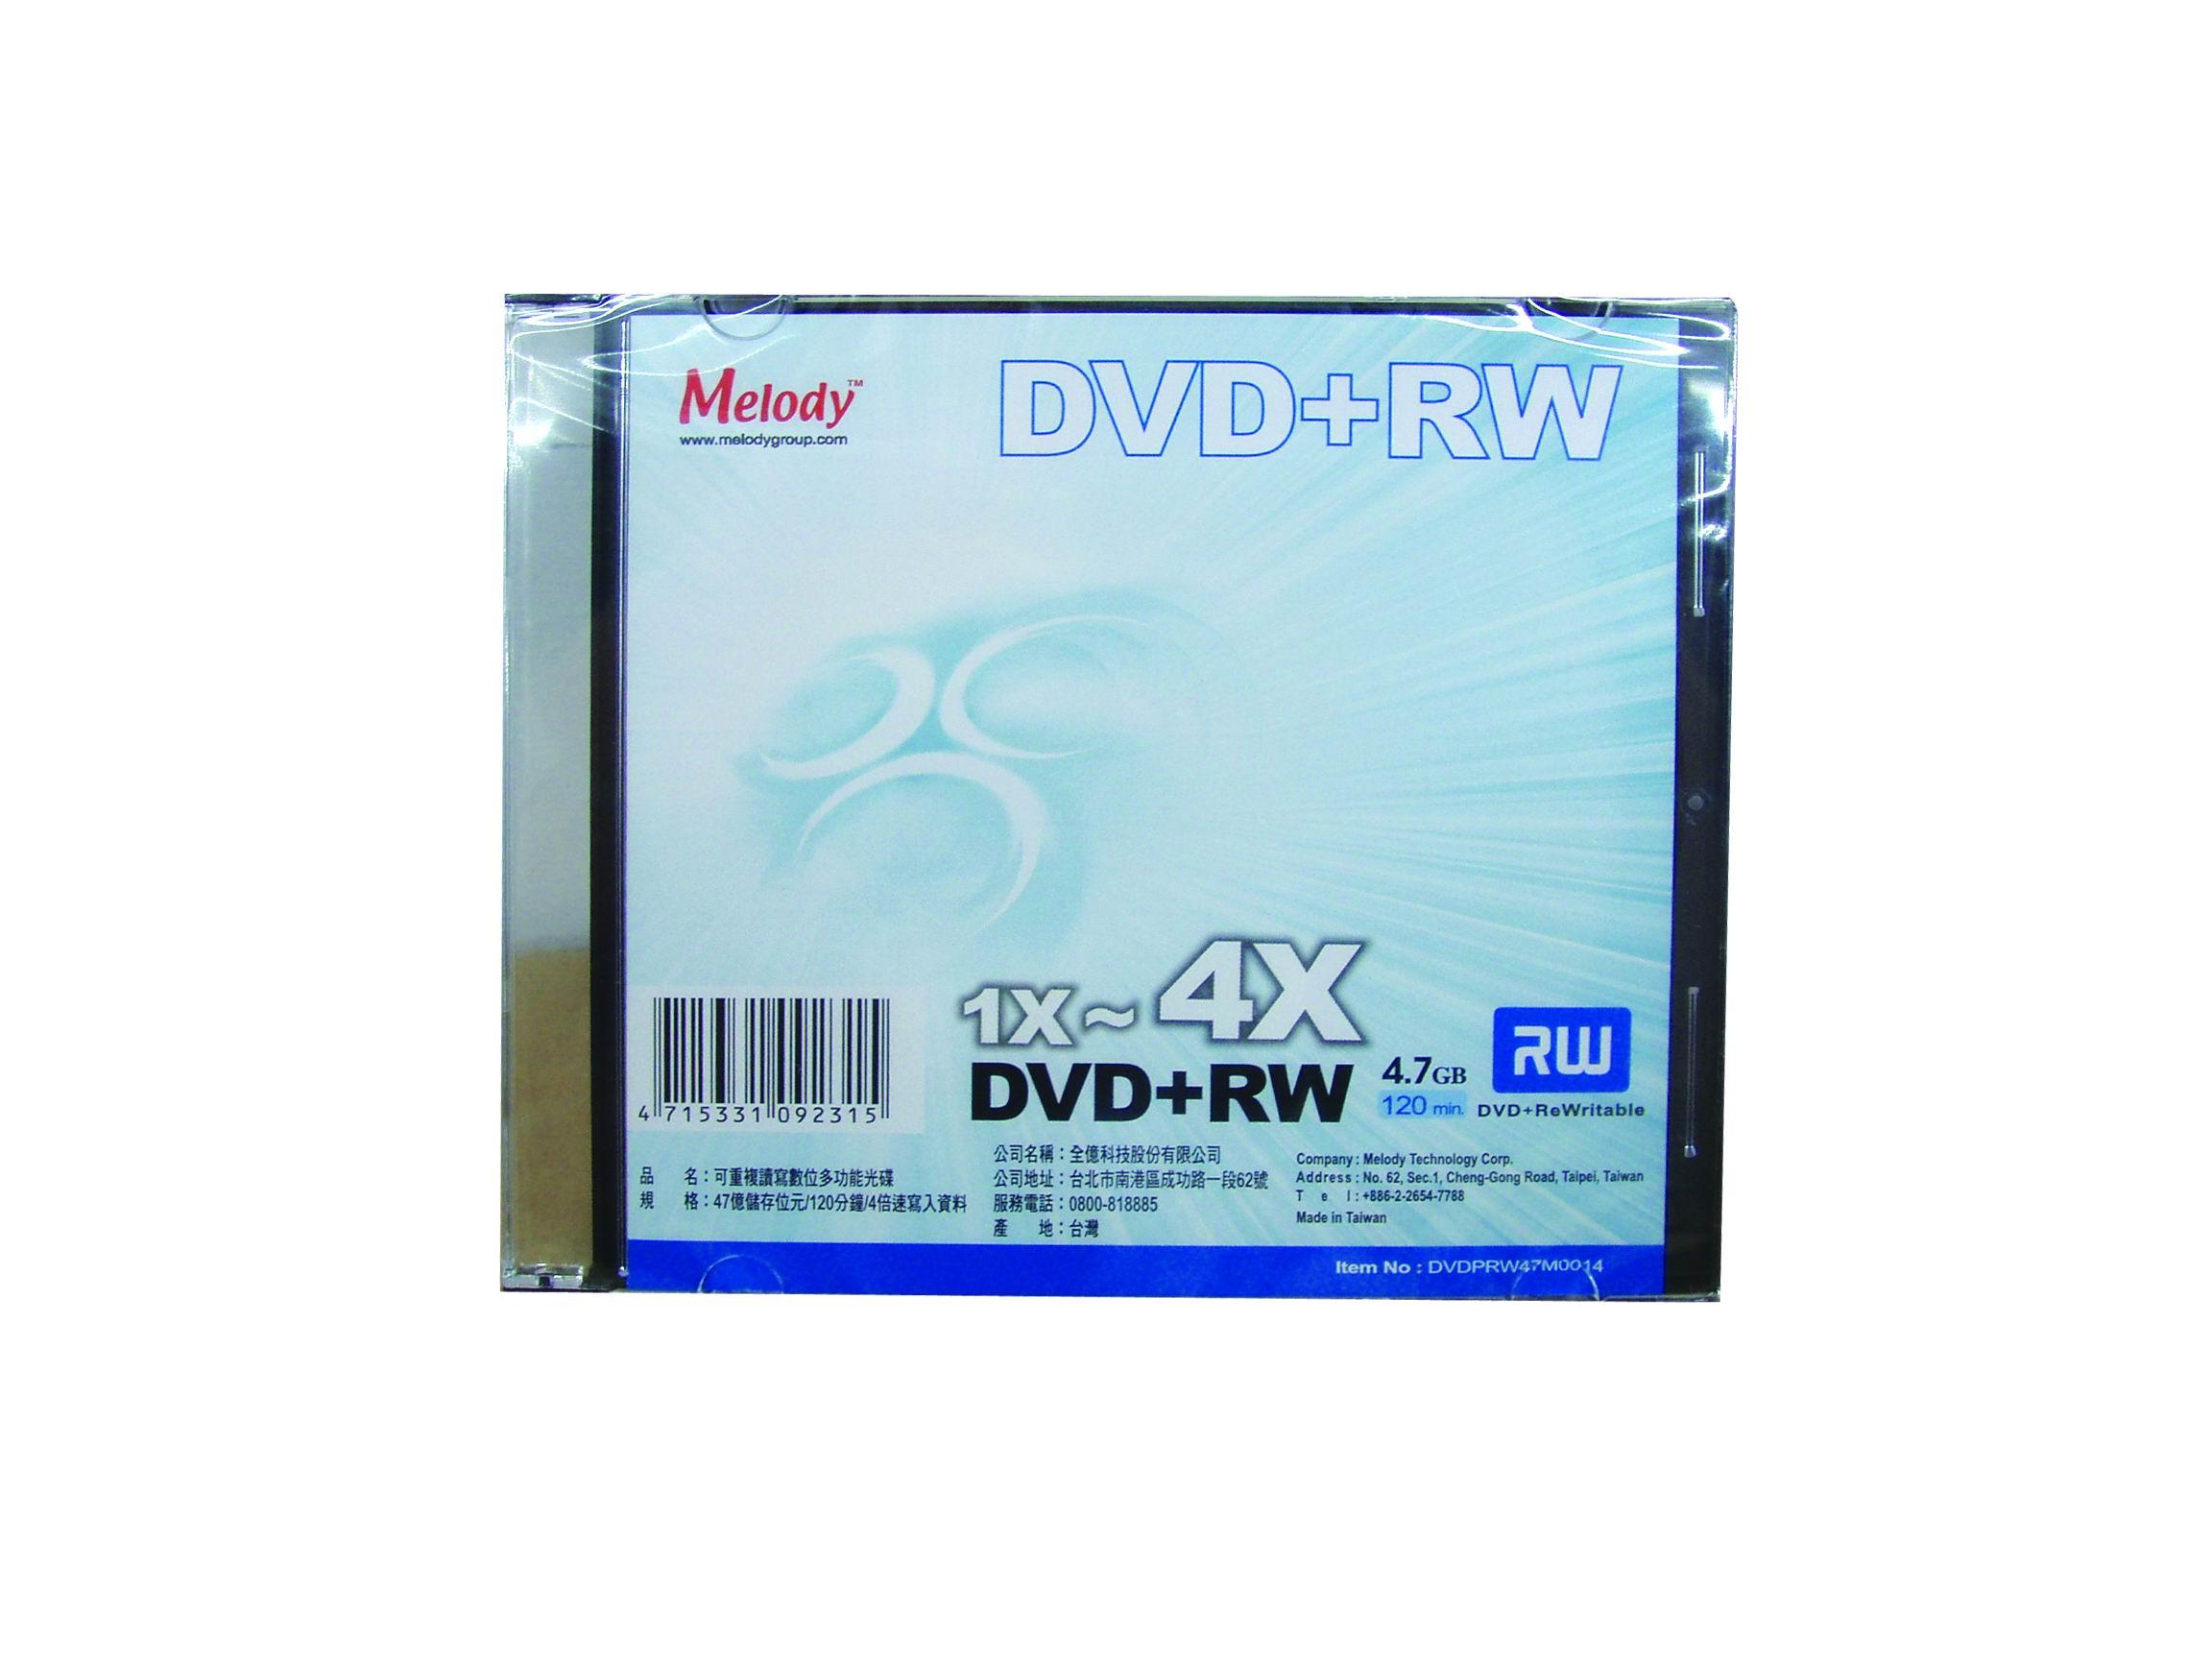 Melody DVD+RW 4X 單片裝